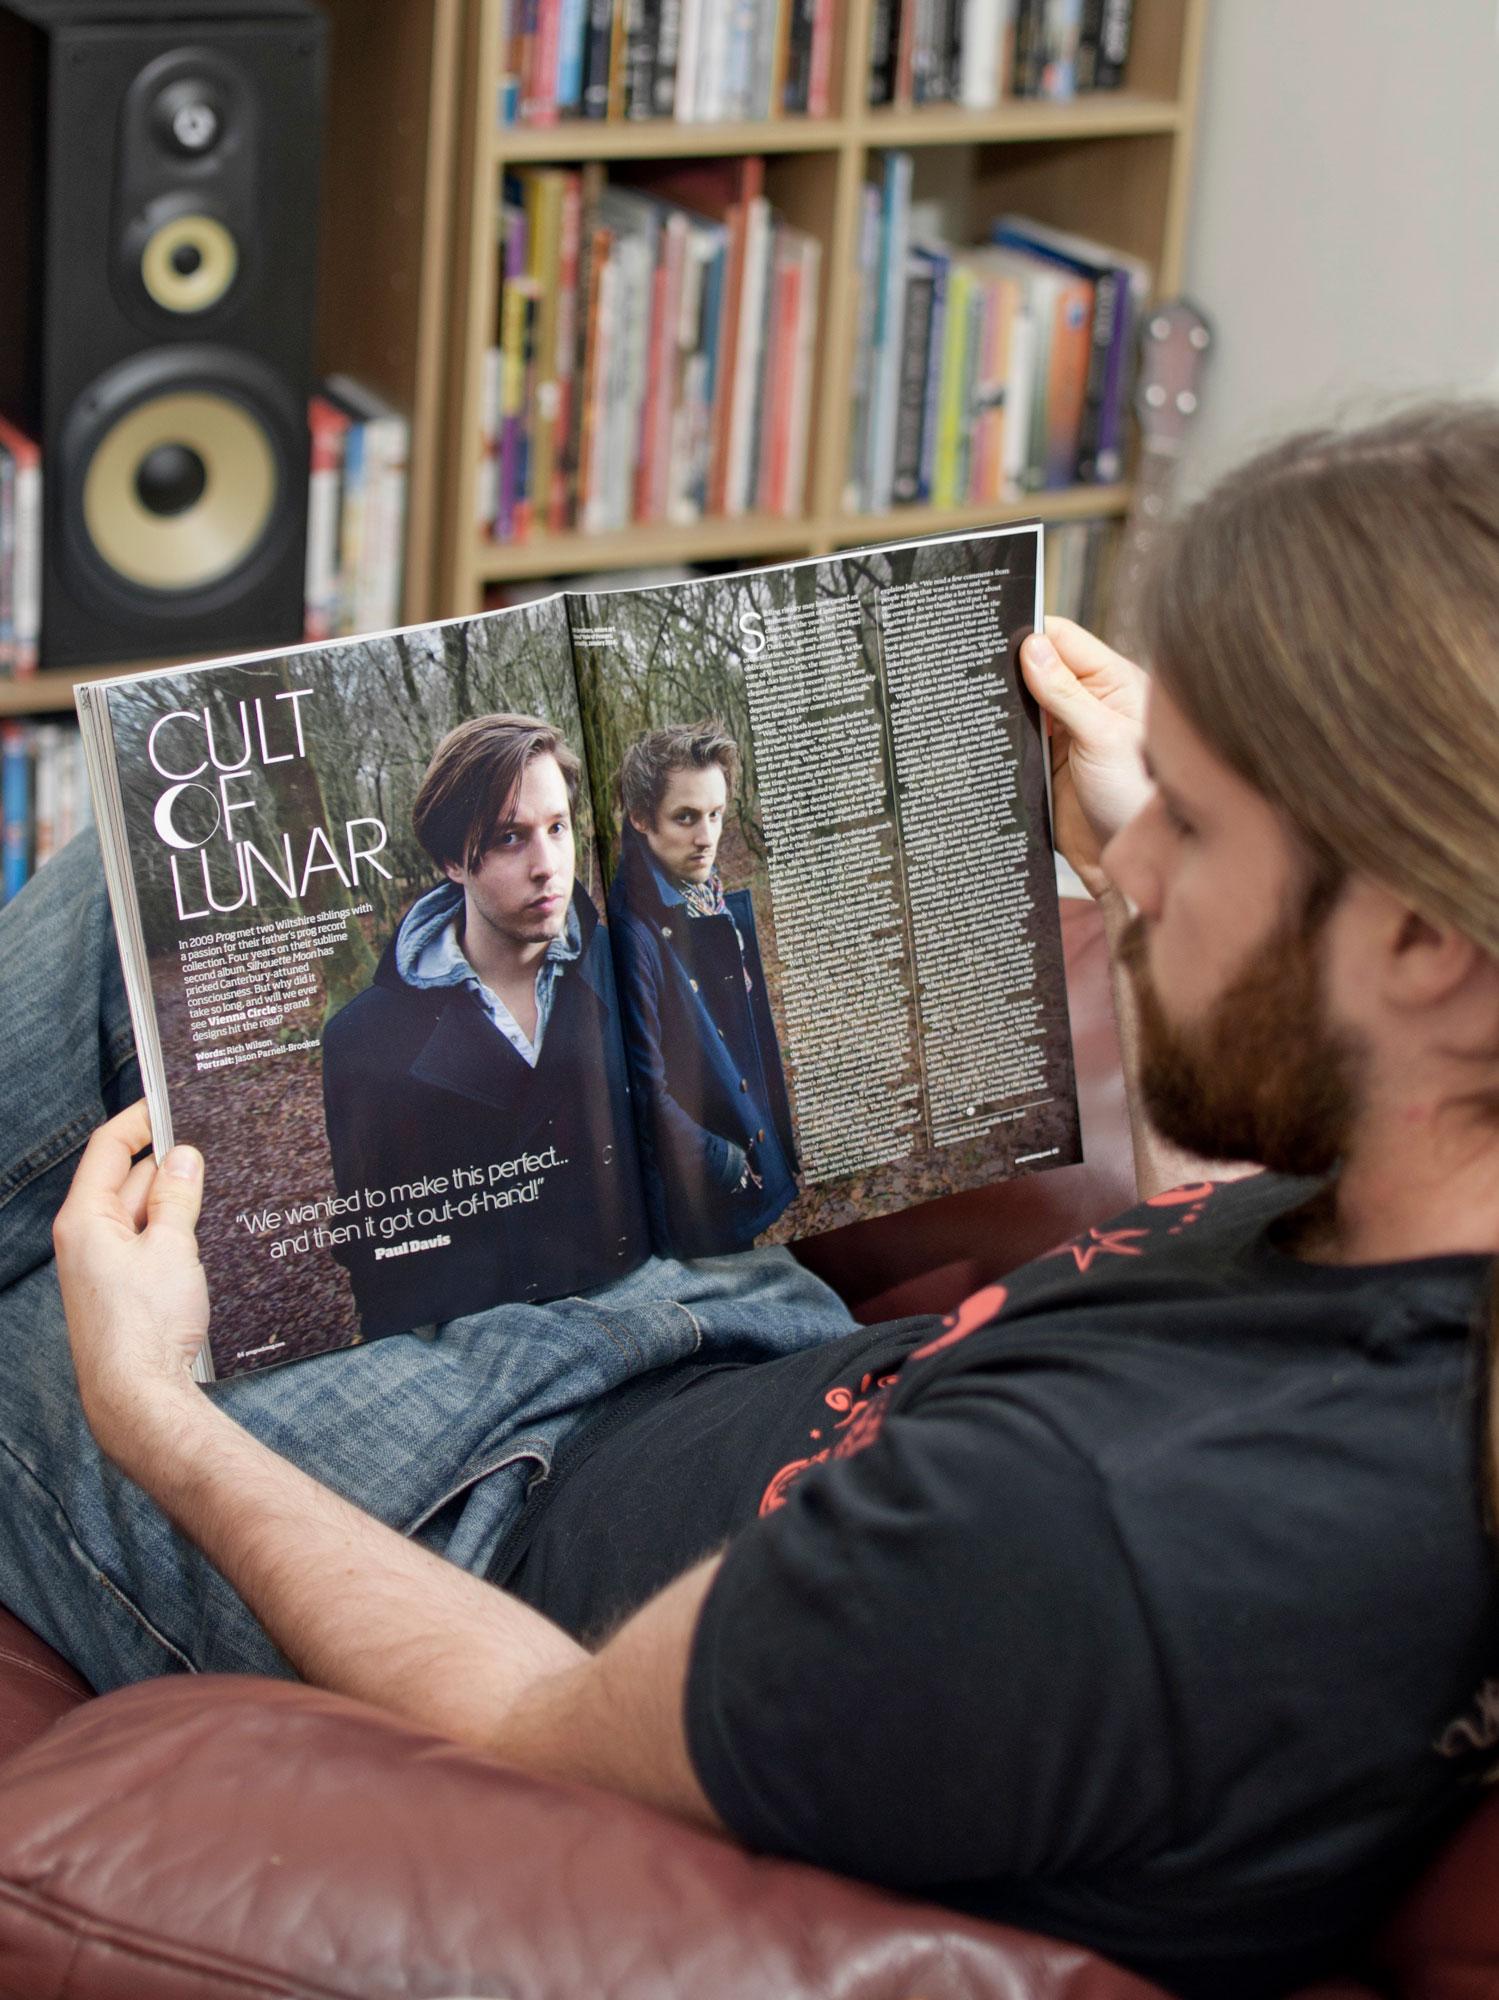 Vienna Circle shot for Prog Rock magazine